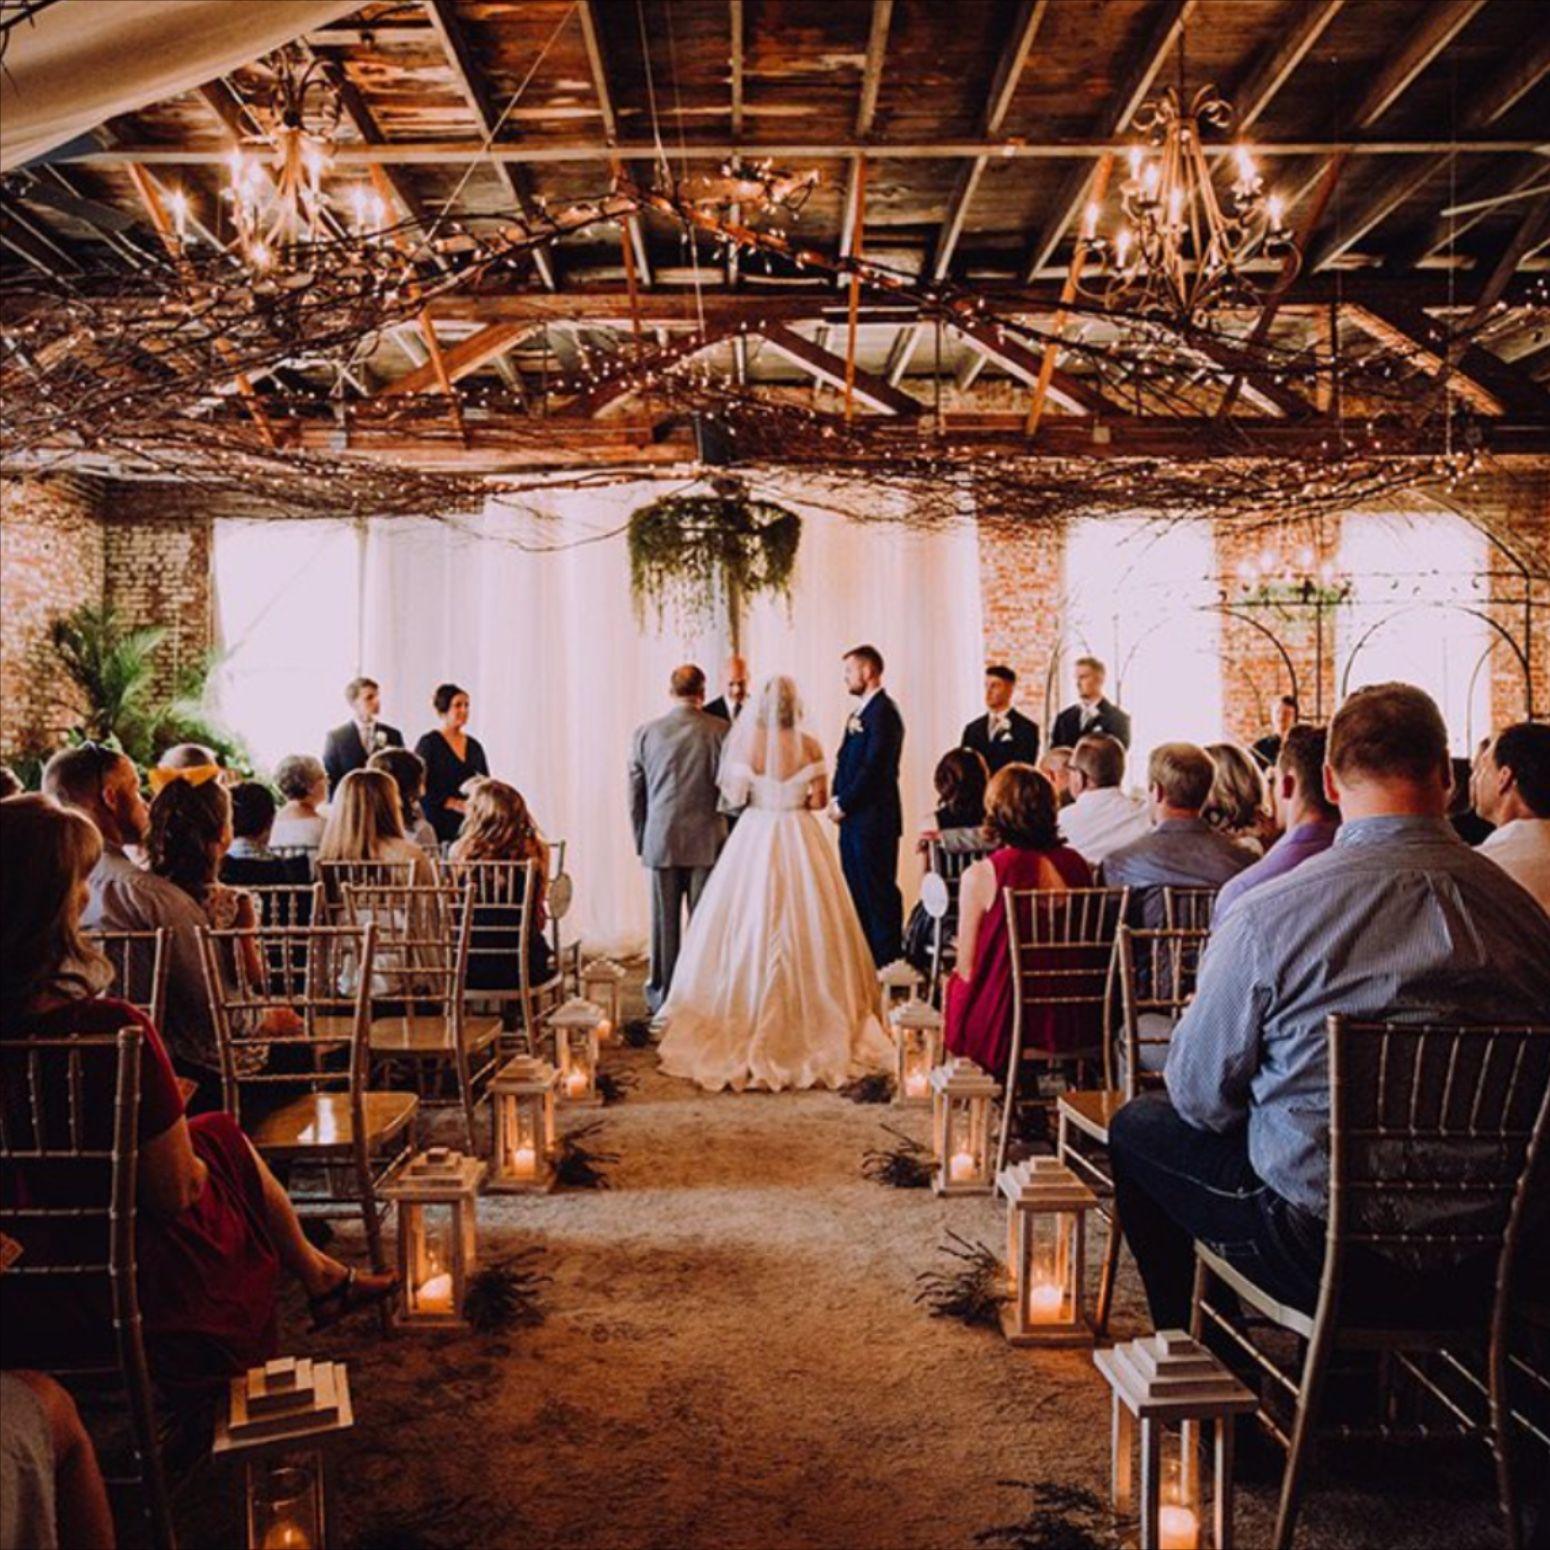 Wedding Venues In 2020 Wedding Planning Guide Southwest Missouri Wedding Venues